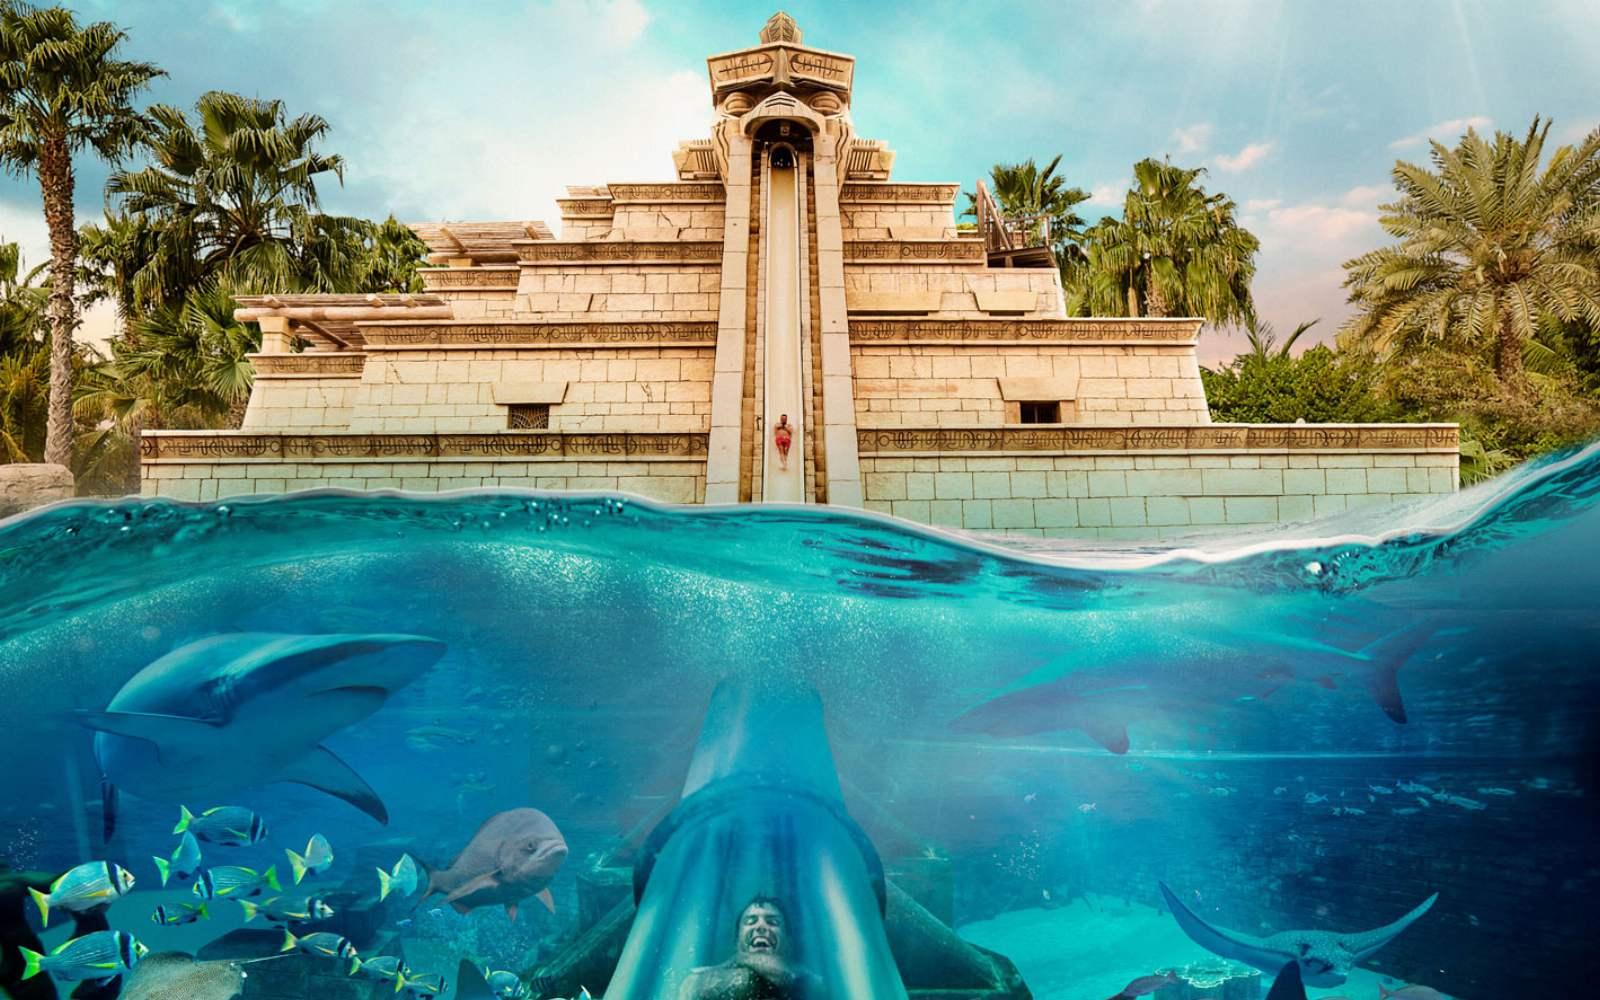 Atlantis, The Palm - Tower of Neptune